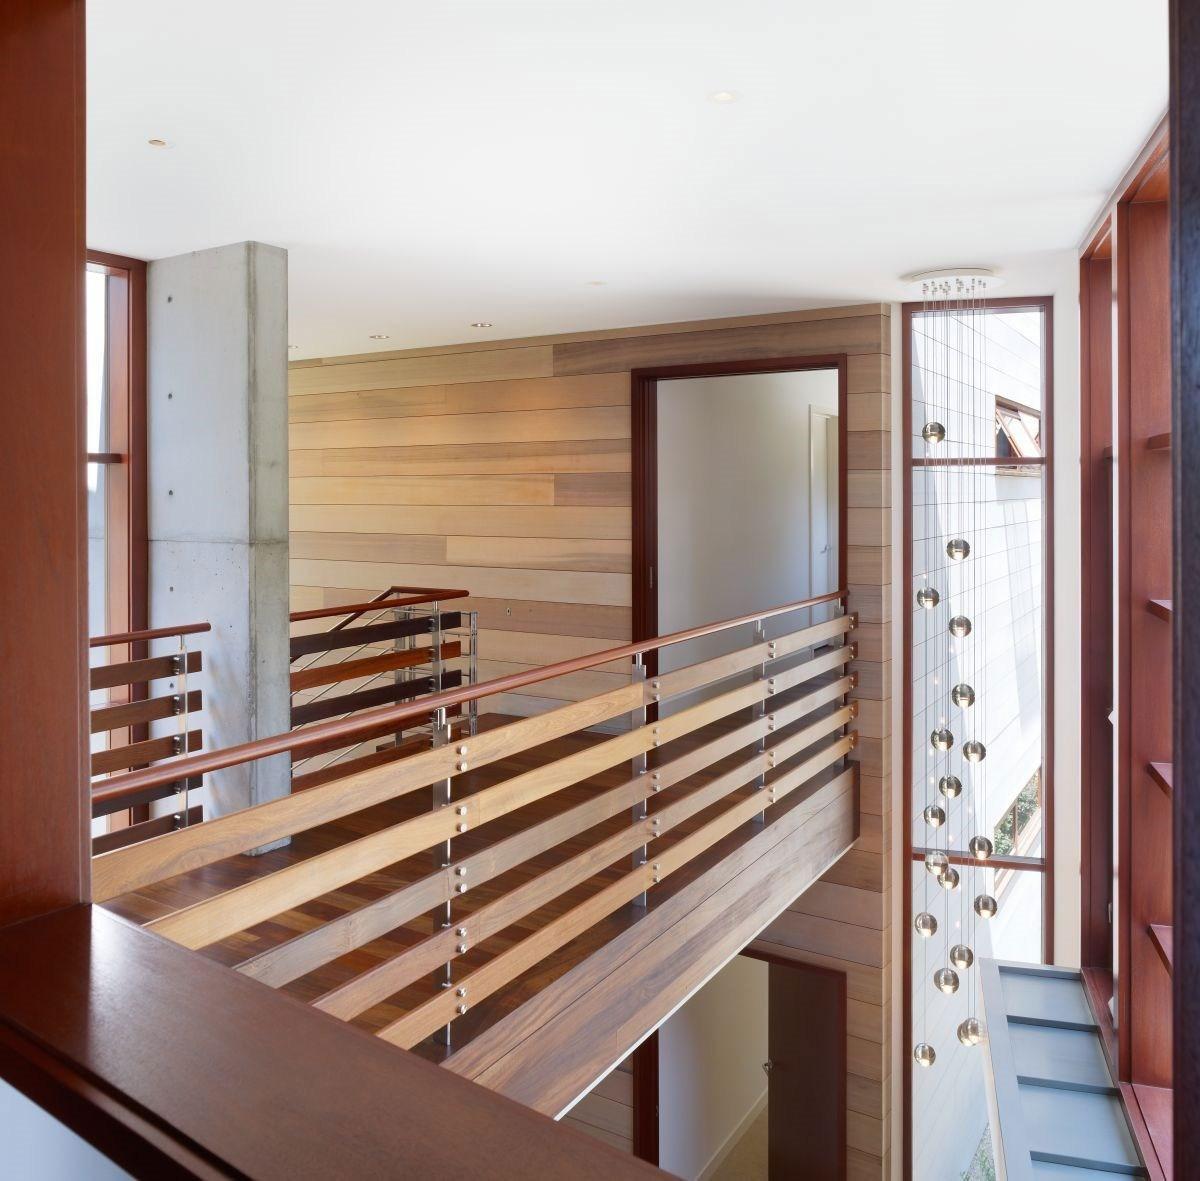 Indoor Bridge And Railings Design Using Wood Ideas Photo   Modern Banisters And Railings